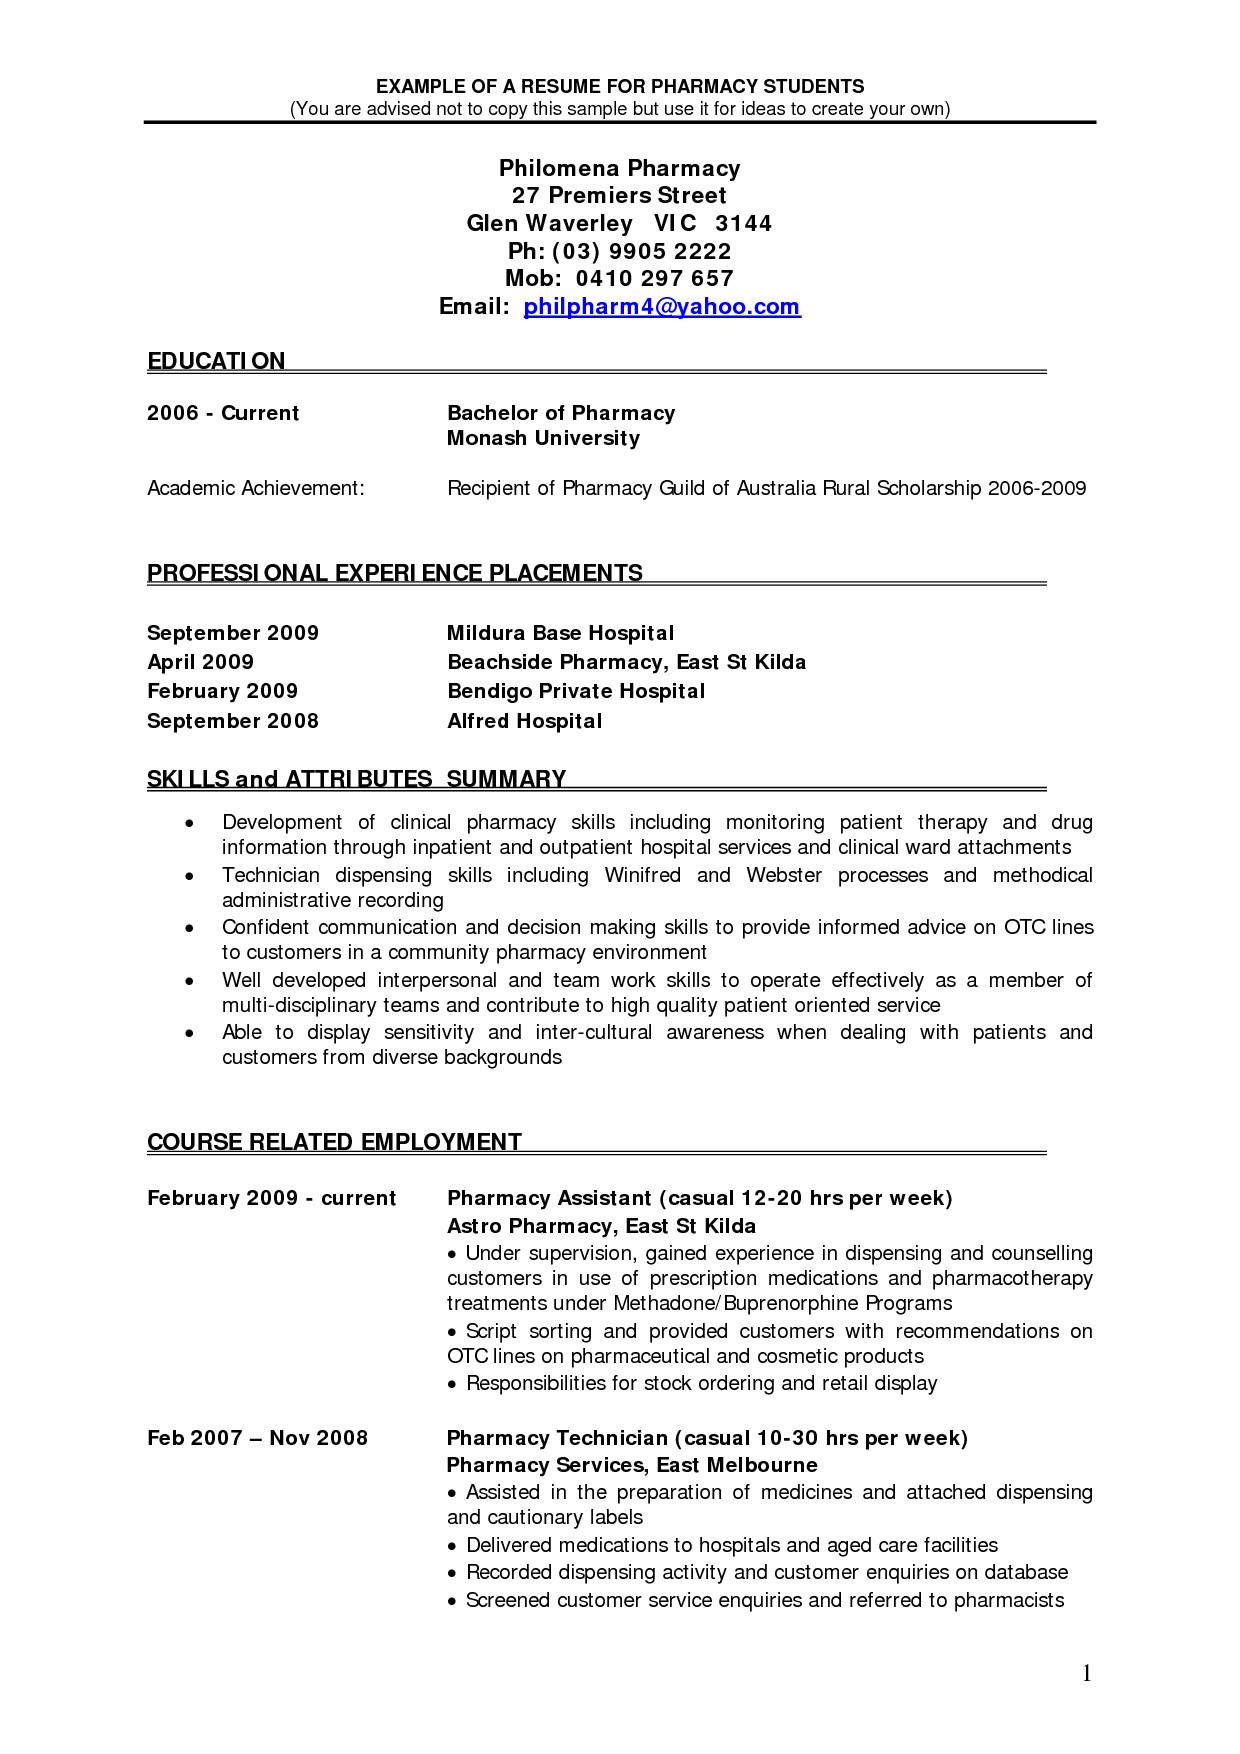 best pharmacist resume sales retail cover letter pharmacy student community resumes